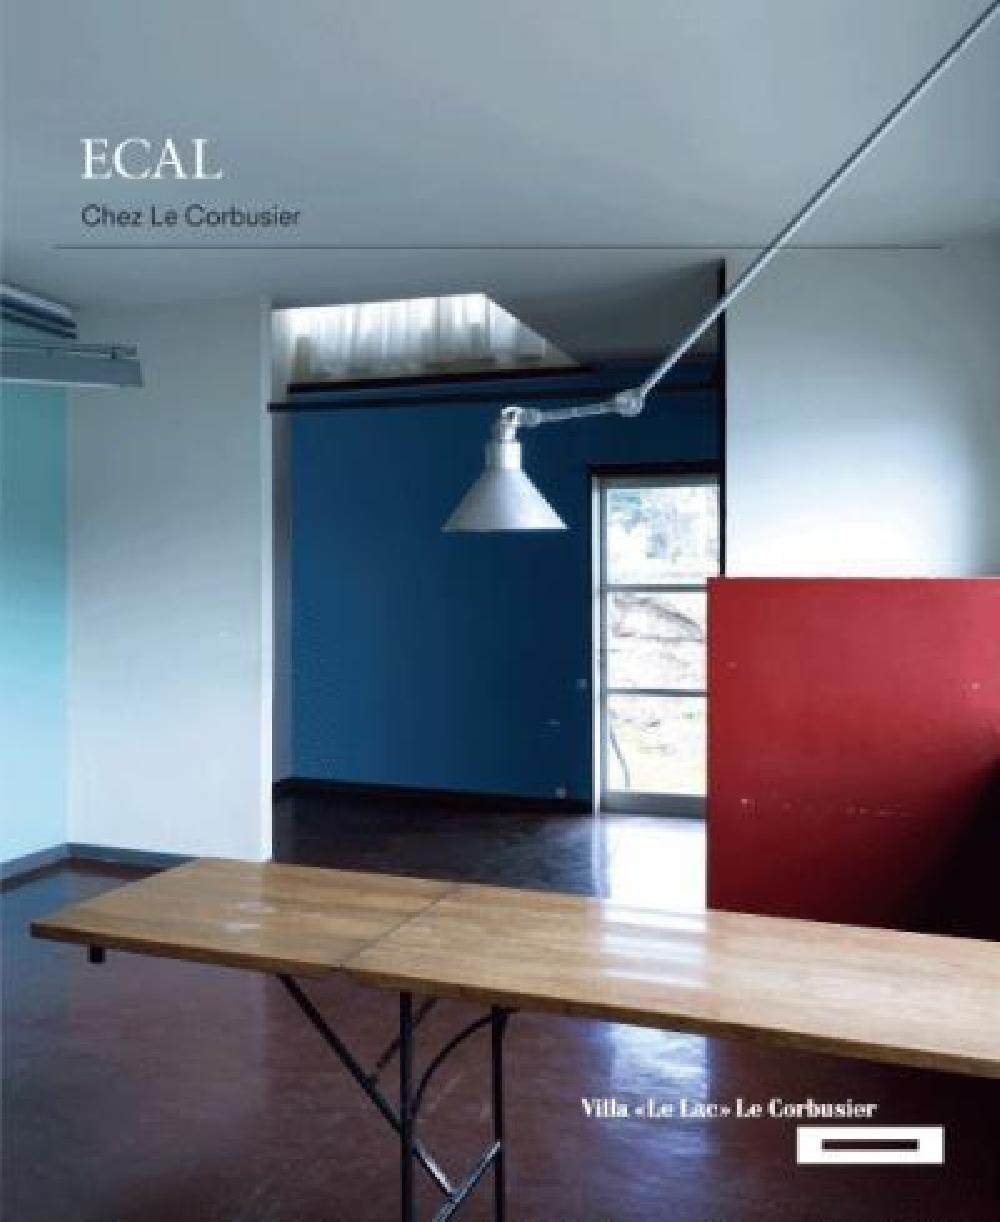 ECAL Chez Le Corbusier / Ecal teaching Le Corbusier